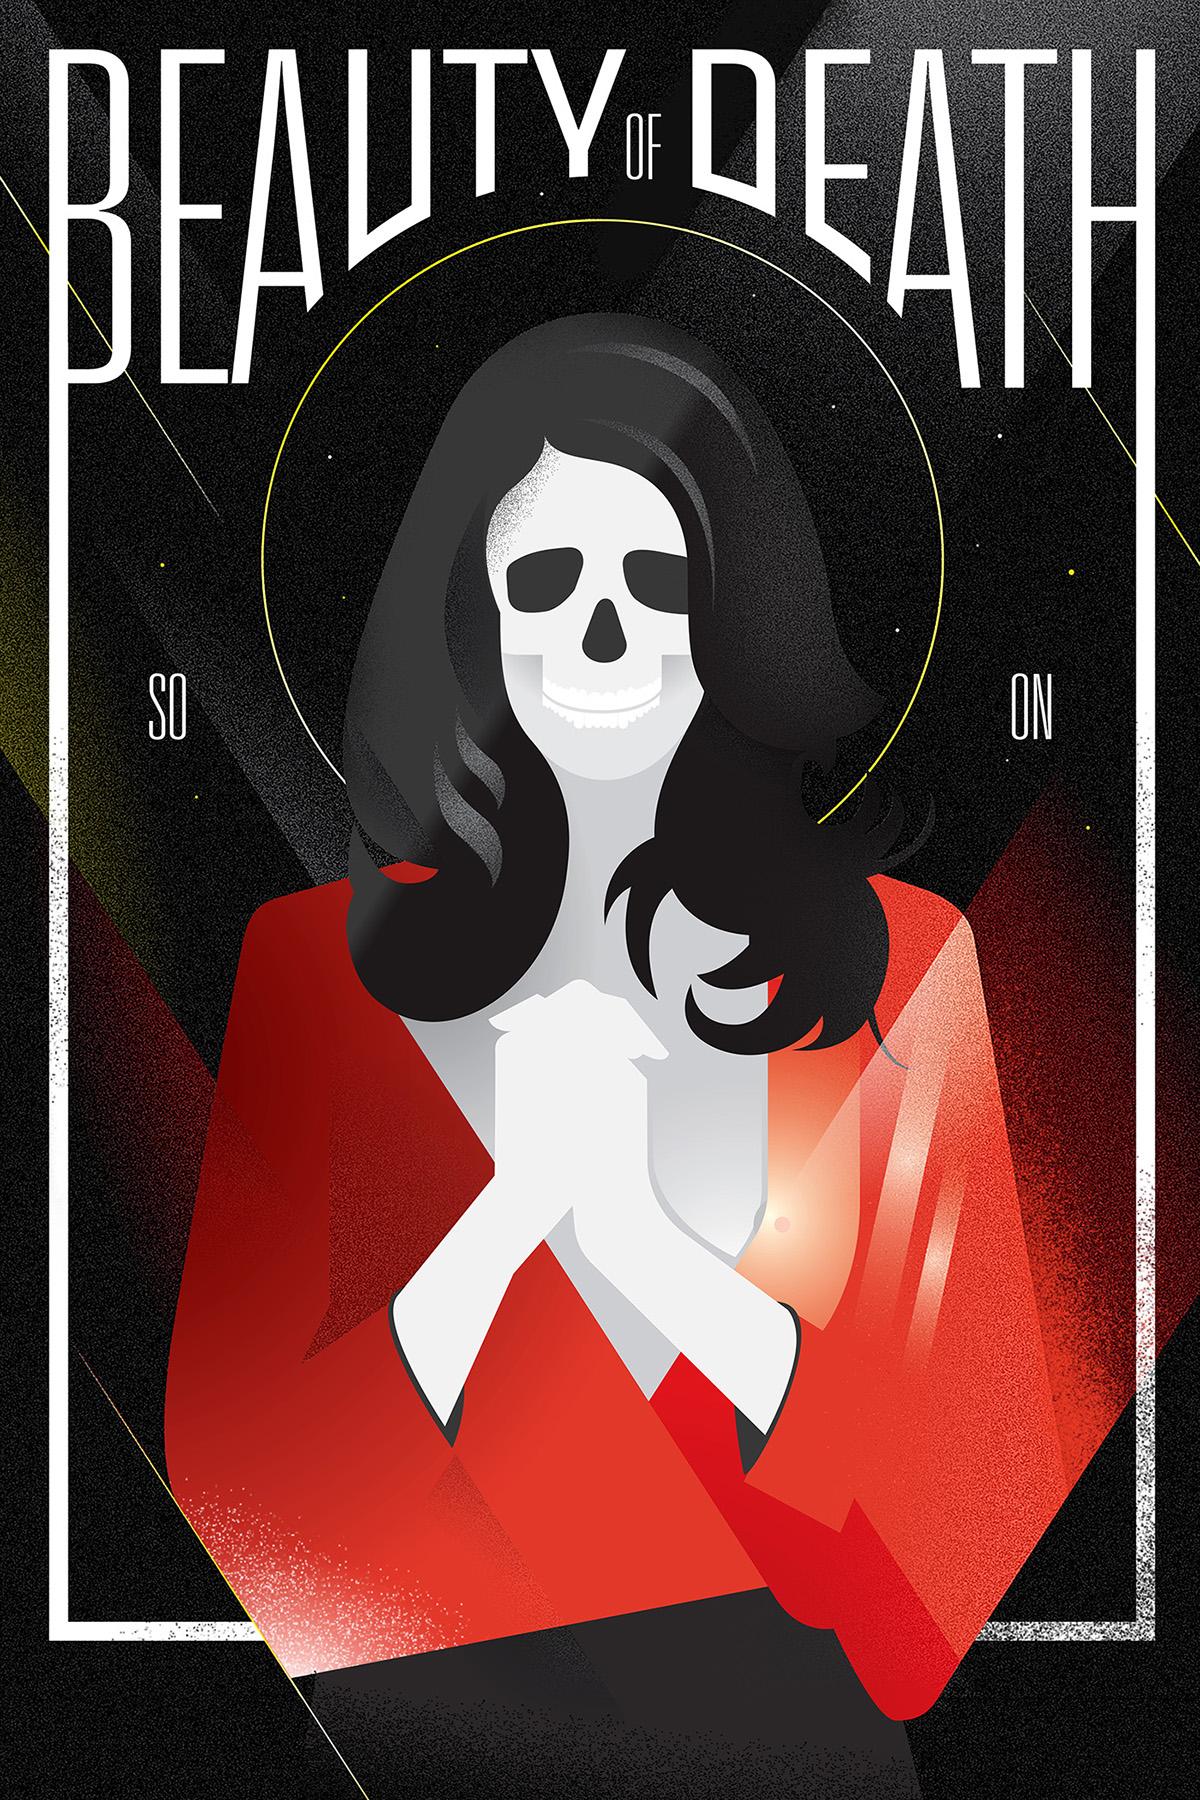 artdeco death skull skeleton artdotz dotz 3s poster Icon art Style woman free download dotz vector